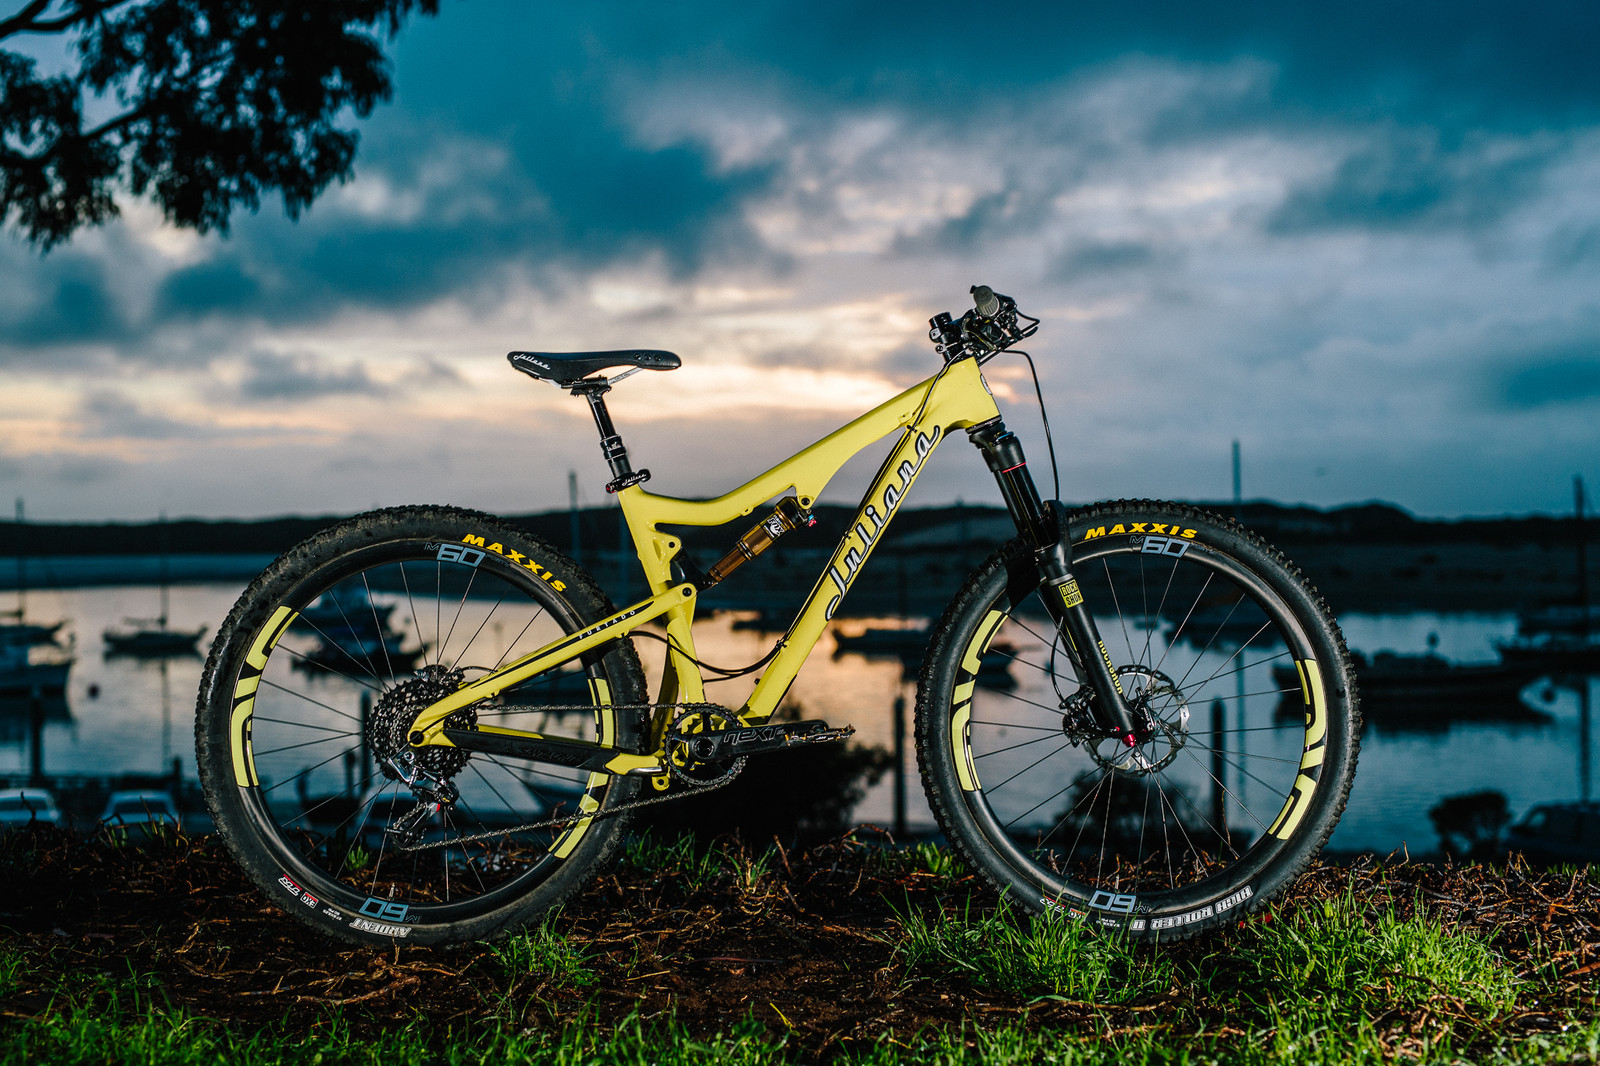 2015 Juliana Furtado - 19 Bikes Tested - 2015 Vital MTB Test Sessions - Mountain Biking Pictures - Vital MTB